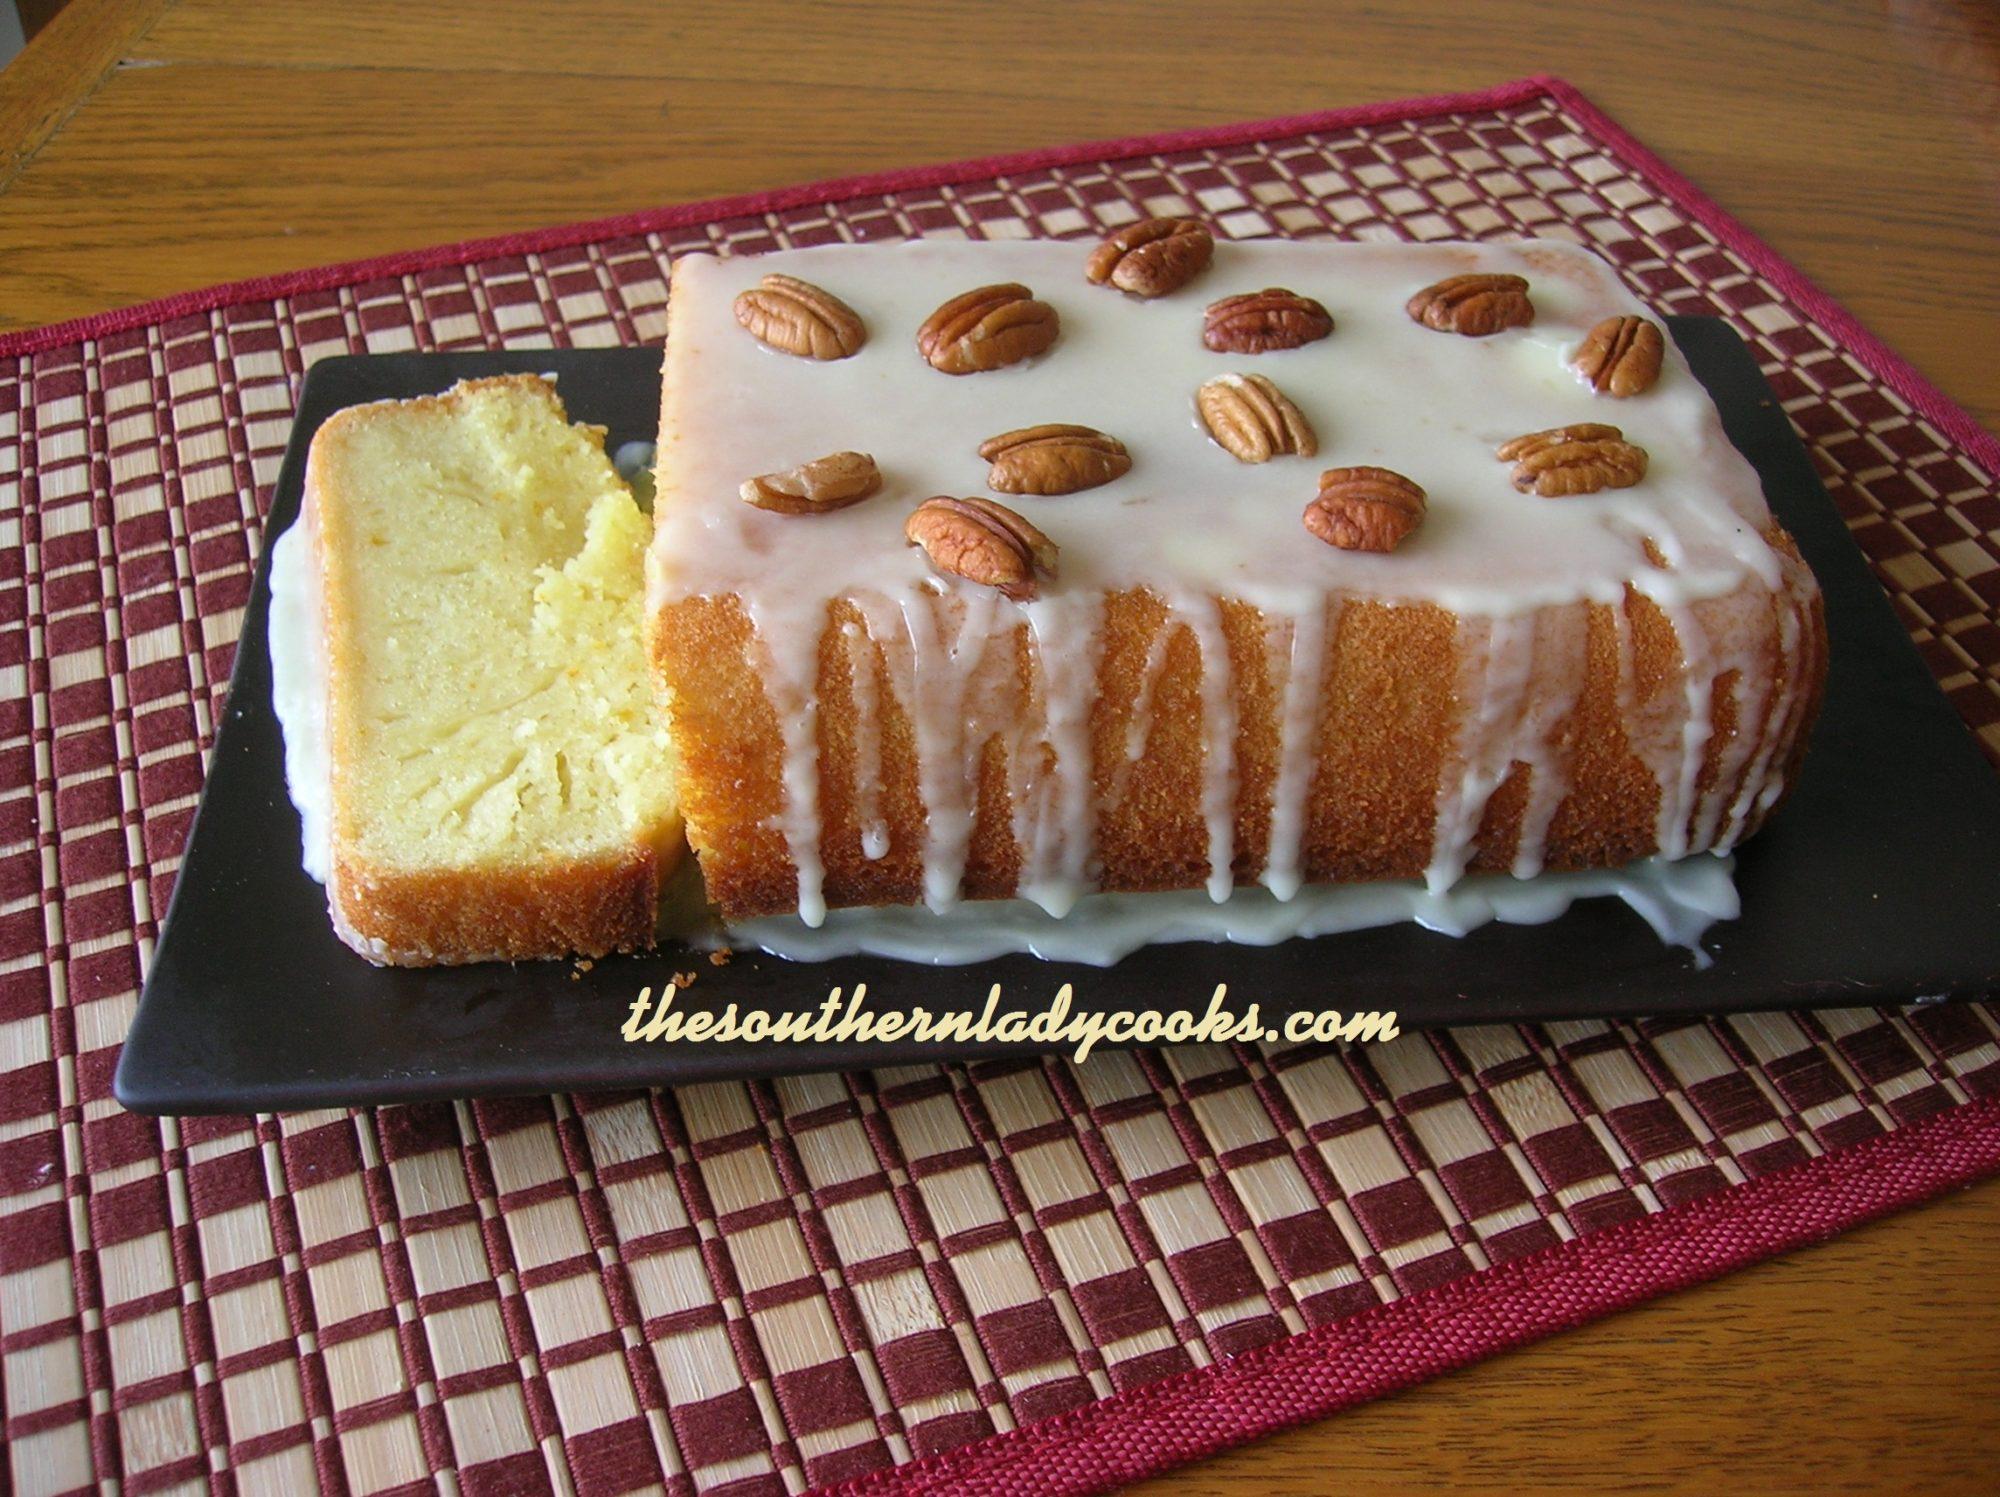 BUTTERY ORANGE POUND CAKE